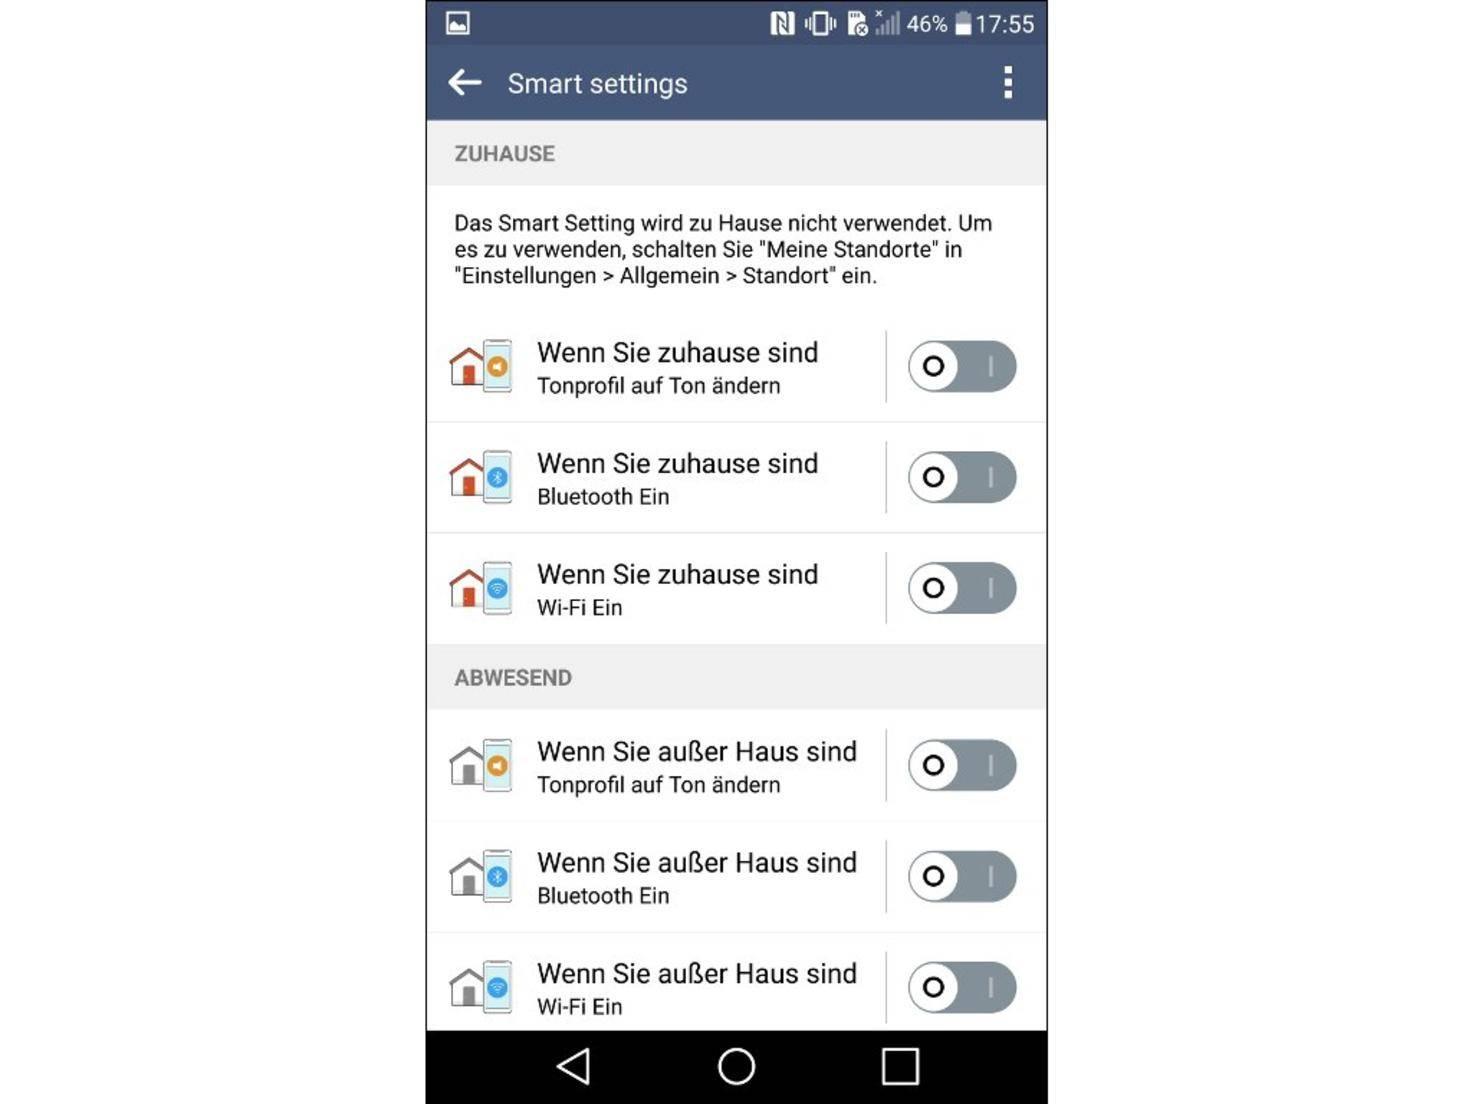 LG G4 Smart settings